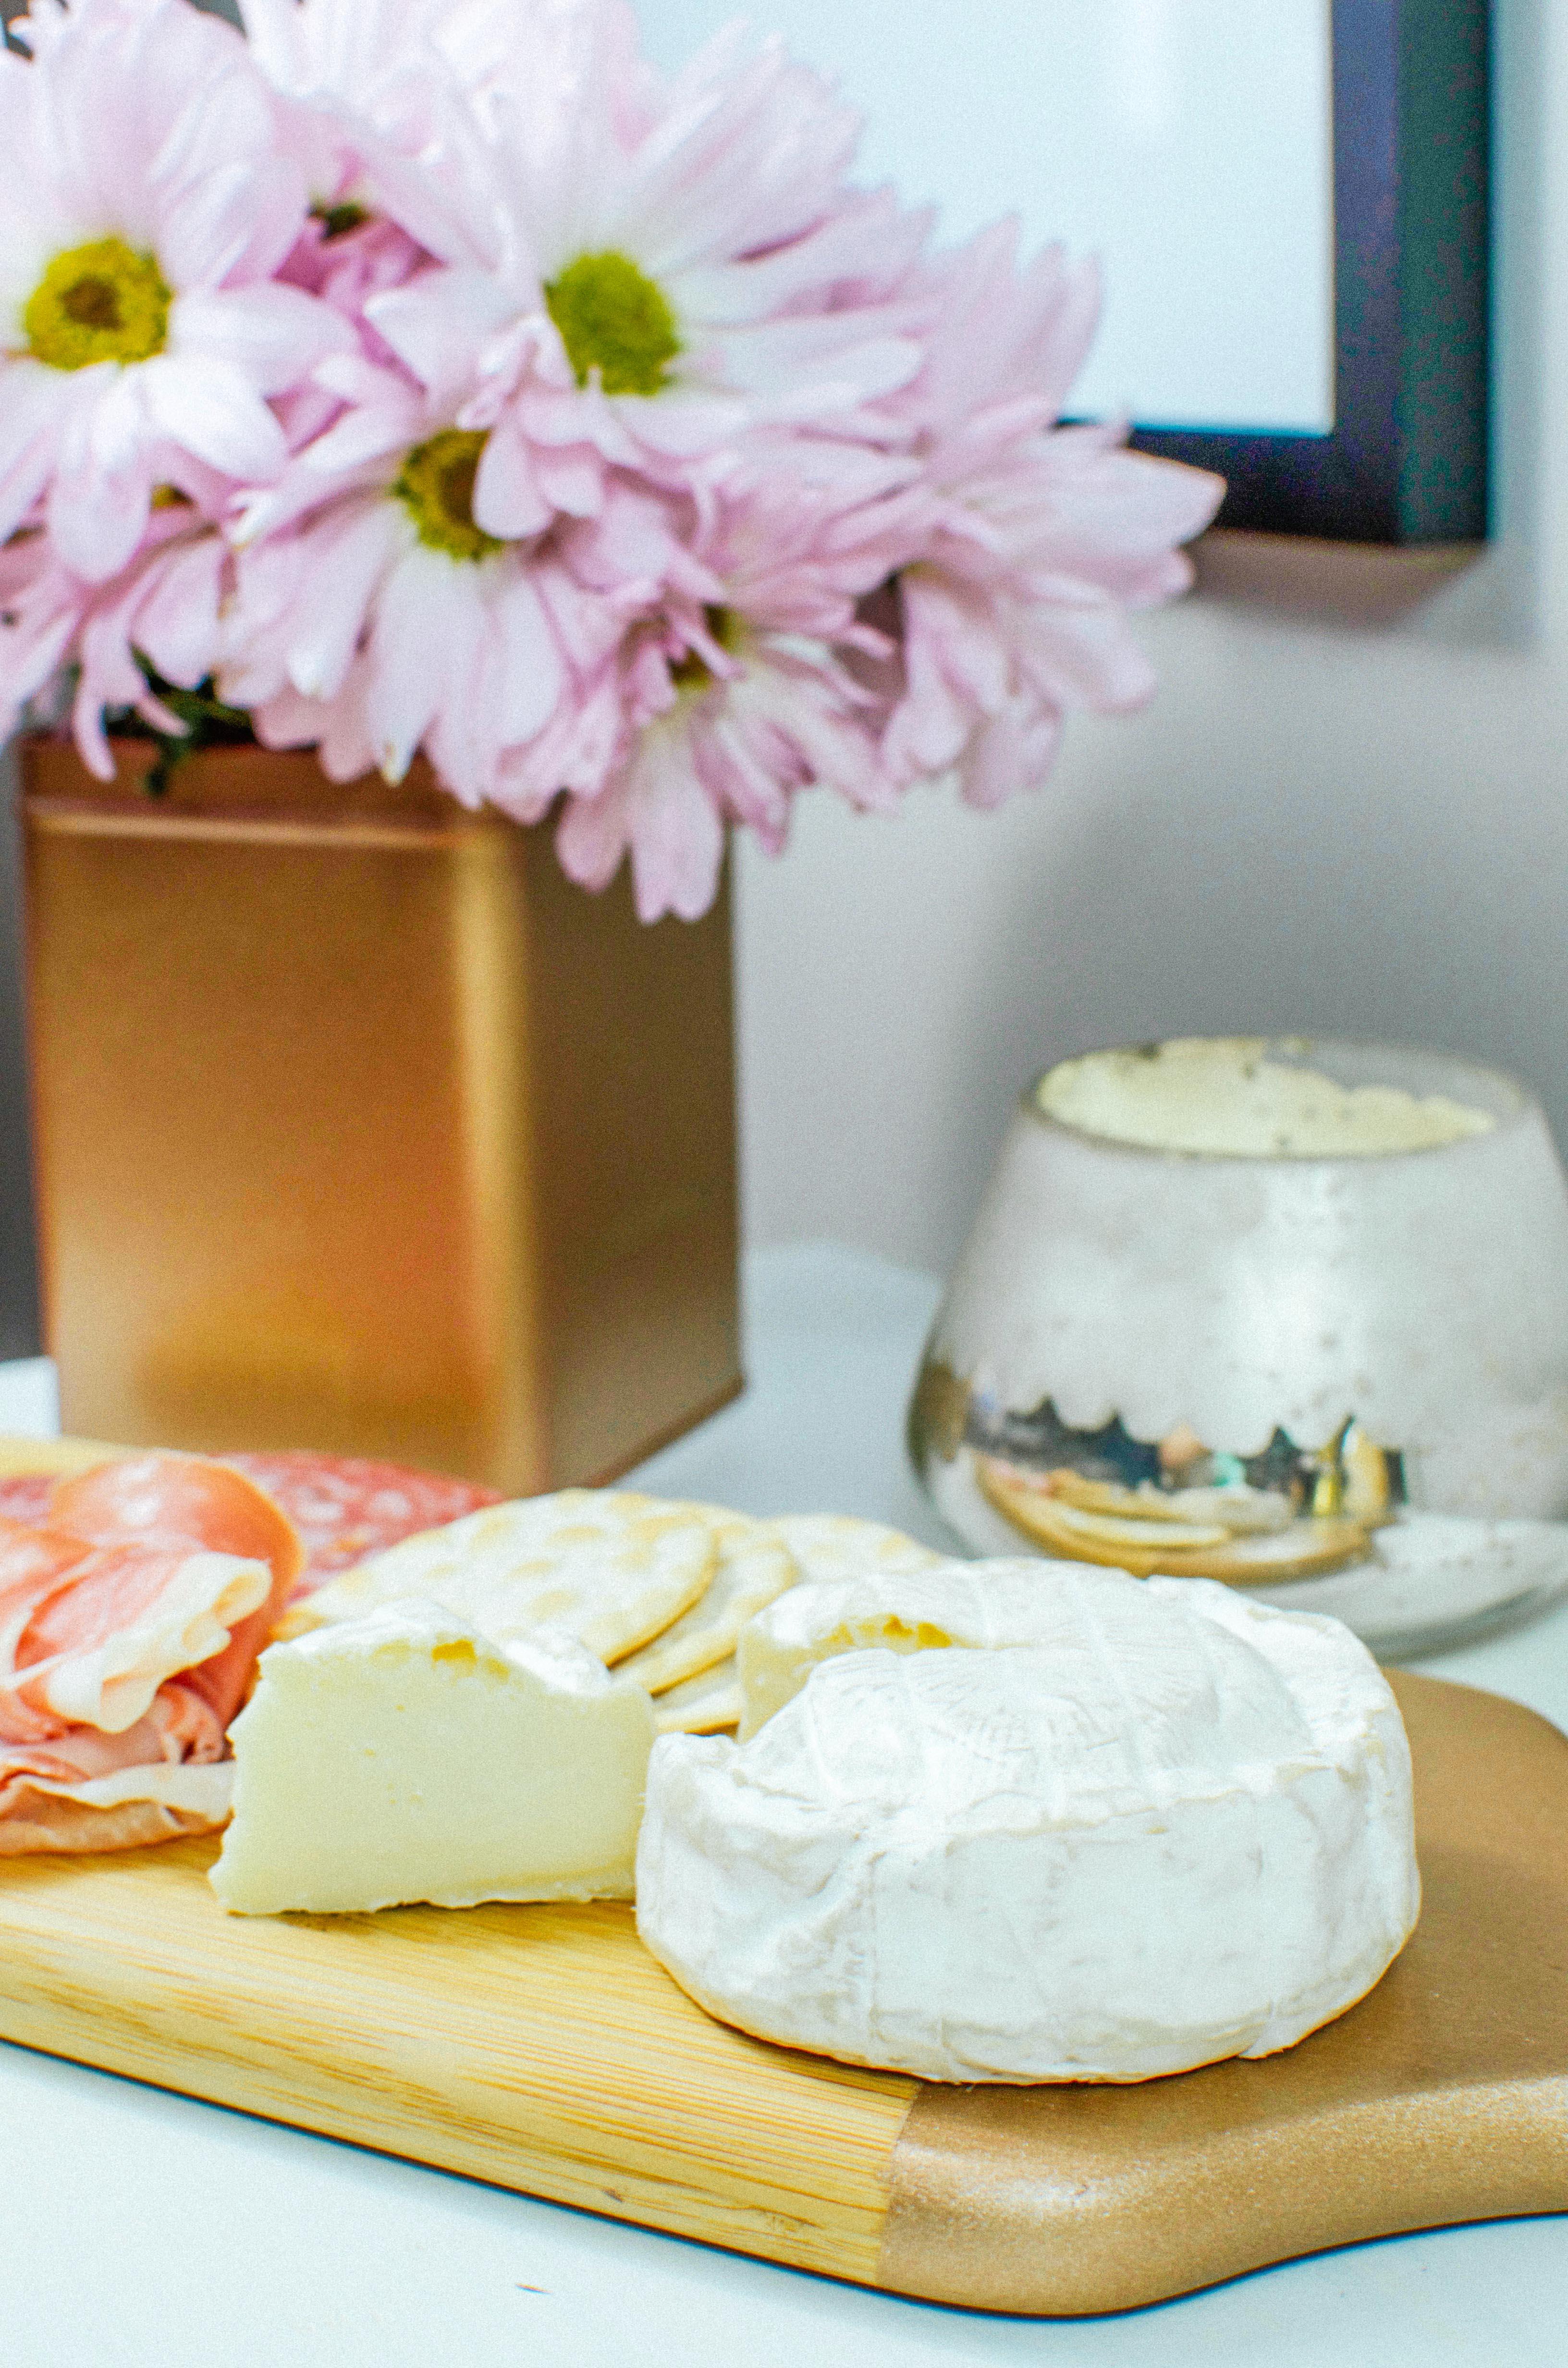 diy rose gold home decor a life well consumed 19 a life. Black Bedroom Furniture Sets. Home Design Ideas